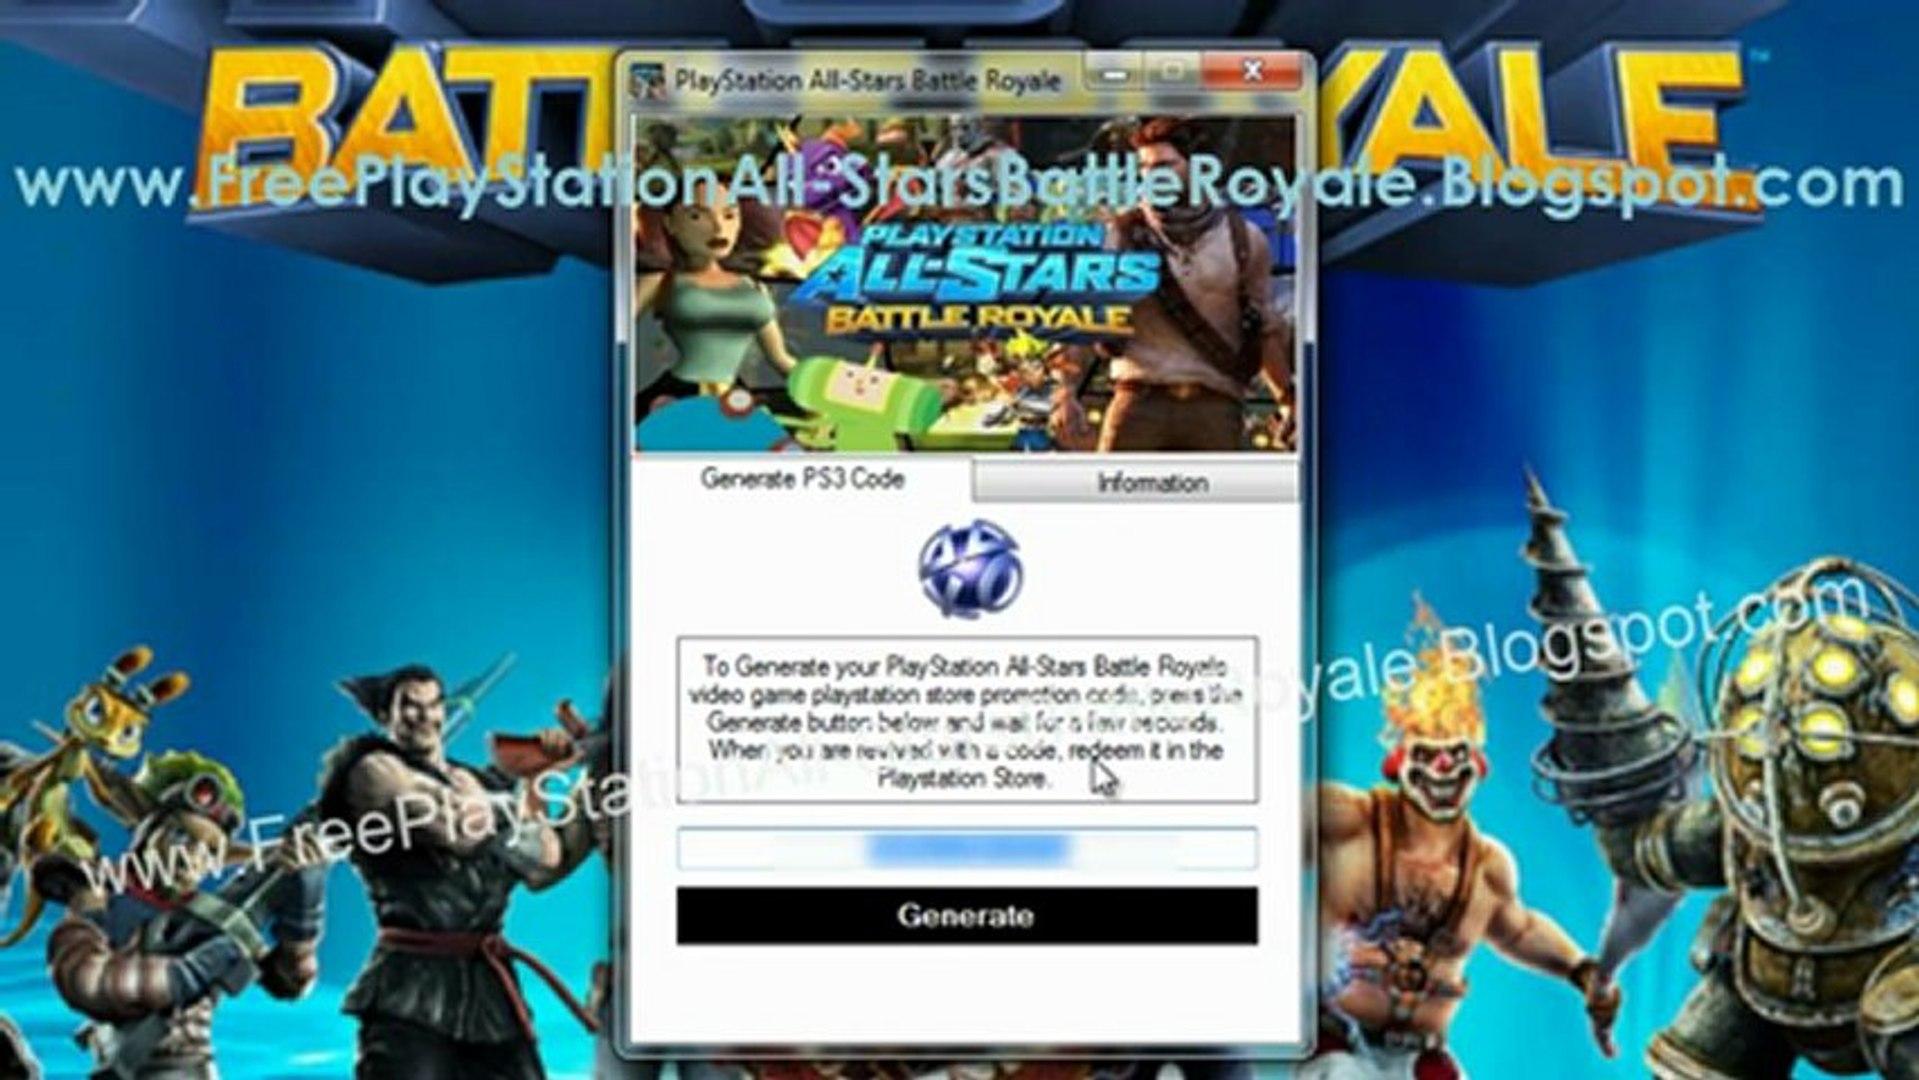 PlayStation All-Stars Battle Royale DLC Full Game Crack + Free Download